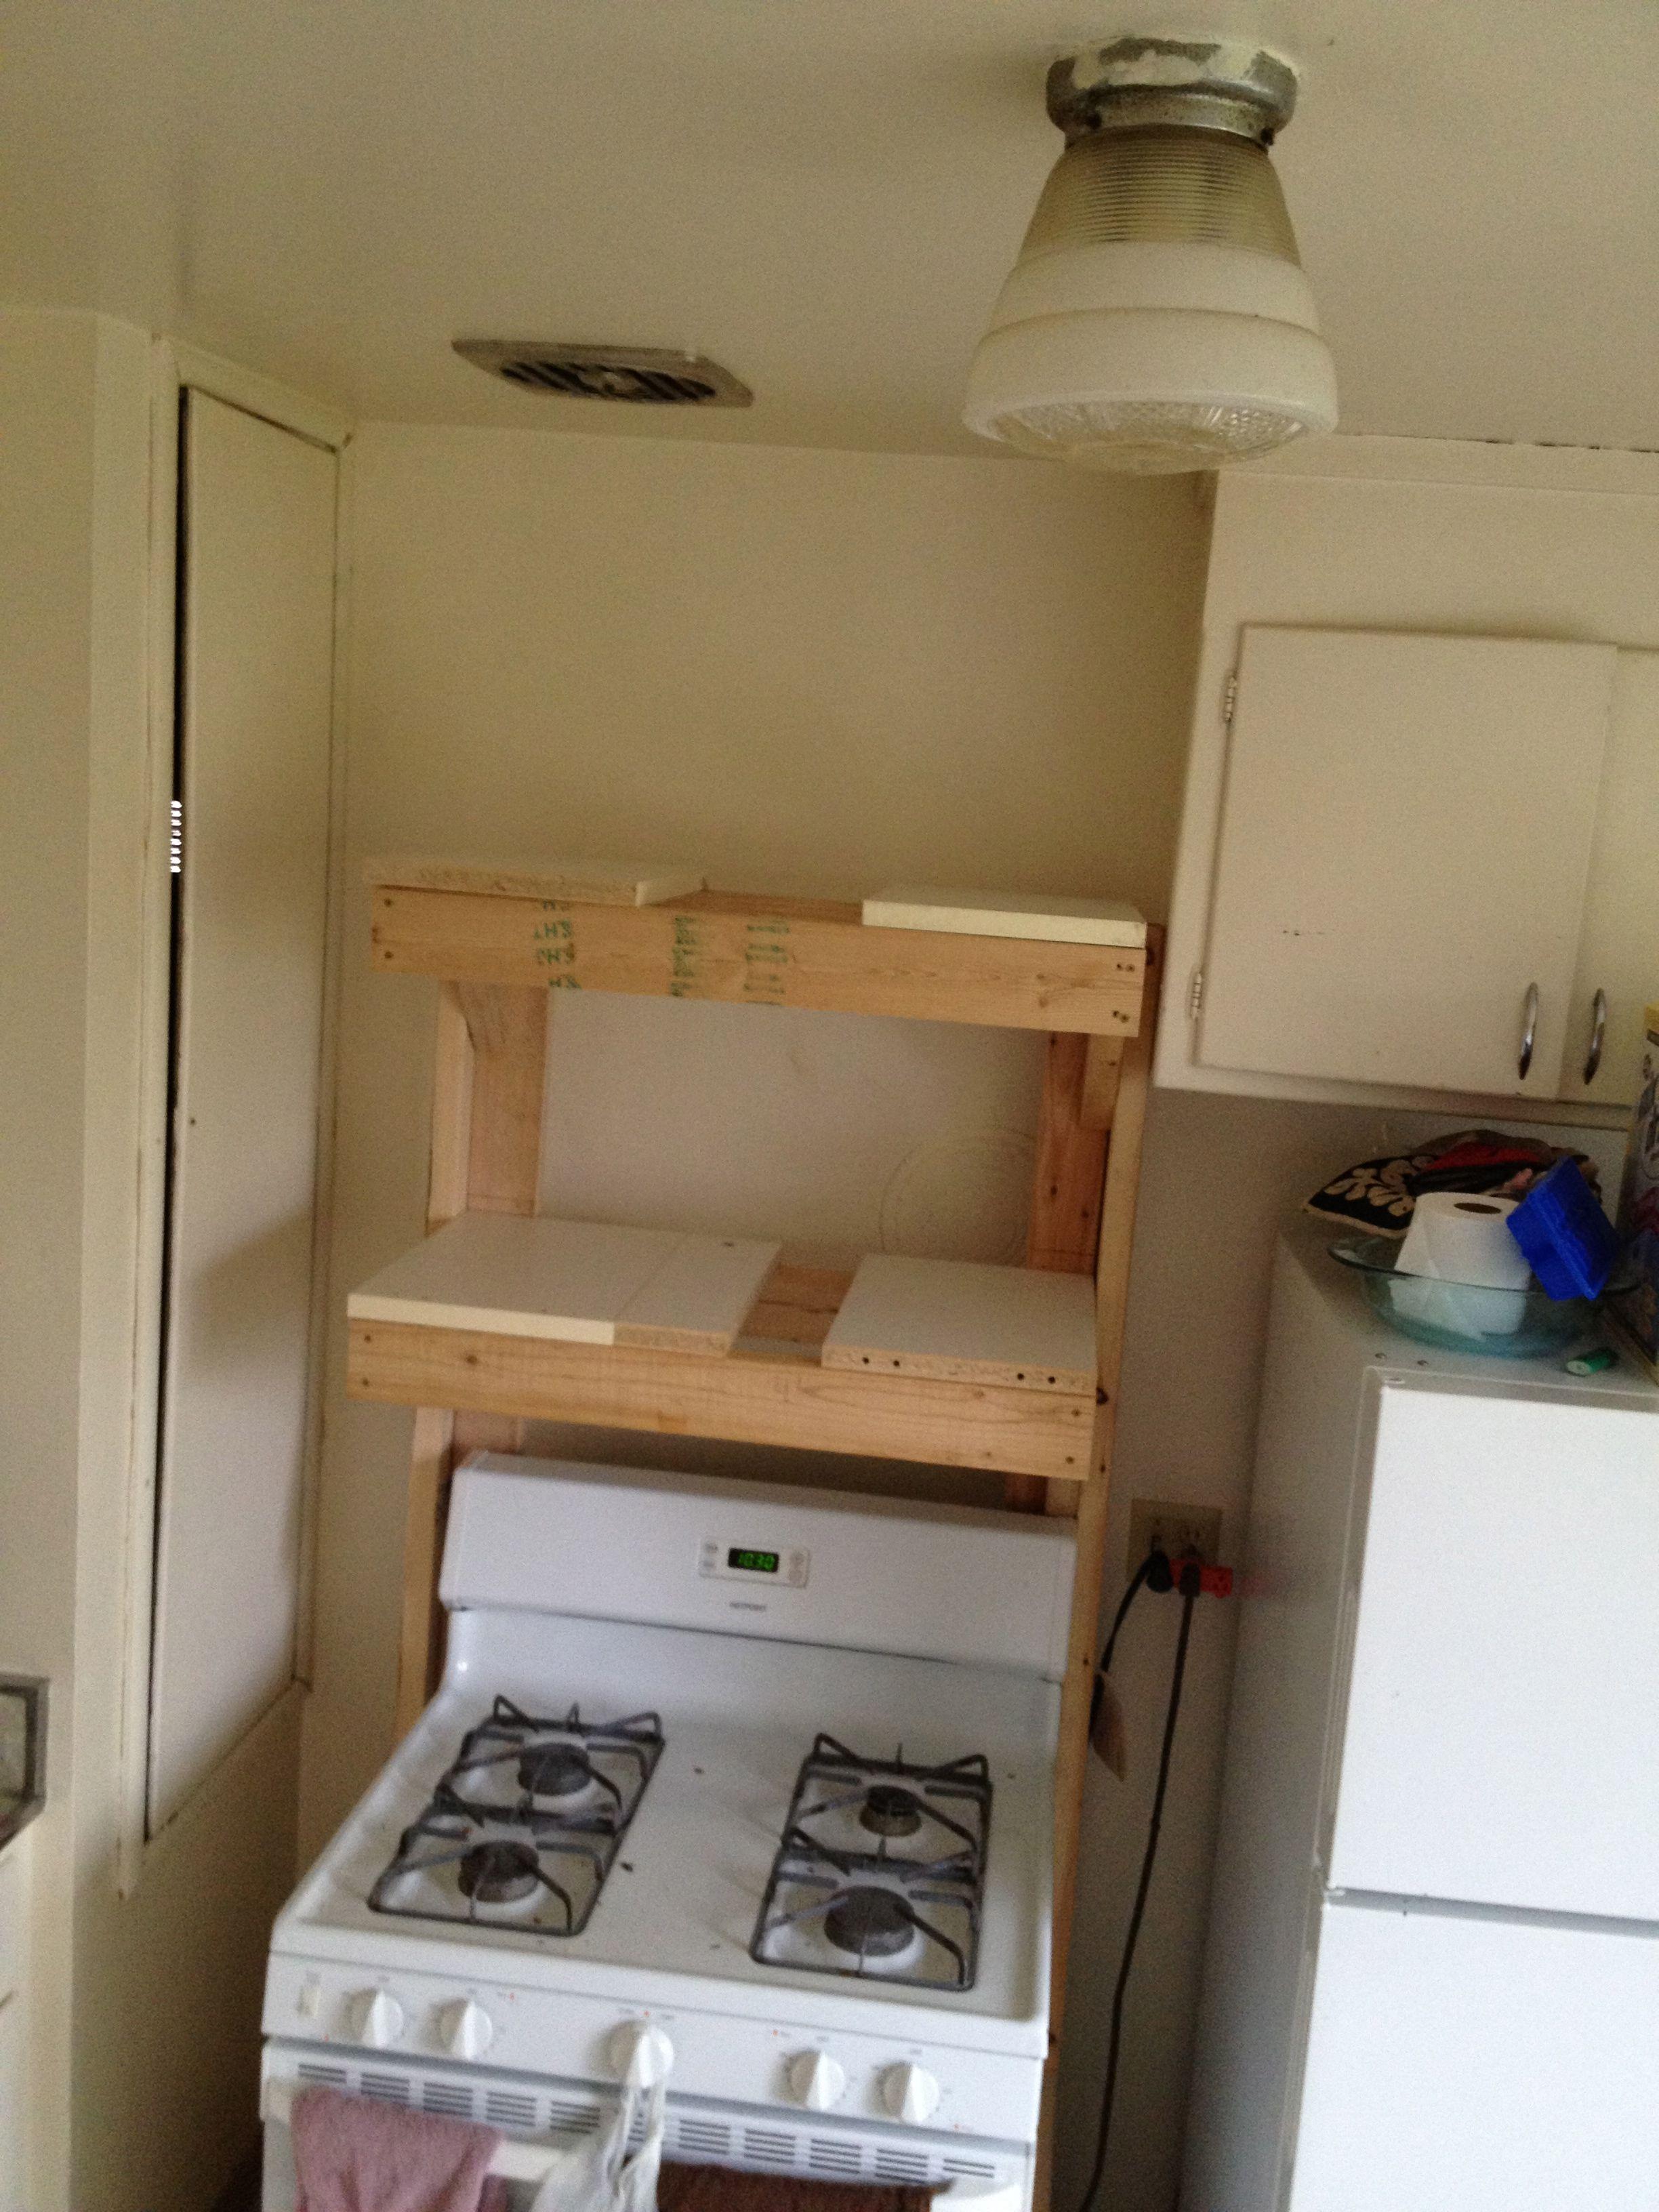 2x4 Freestanding Microwave Shelf Shelves Microwave Shelf Trending Decor